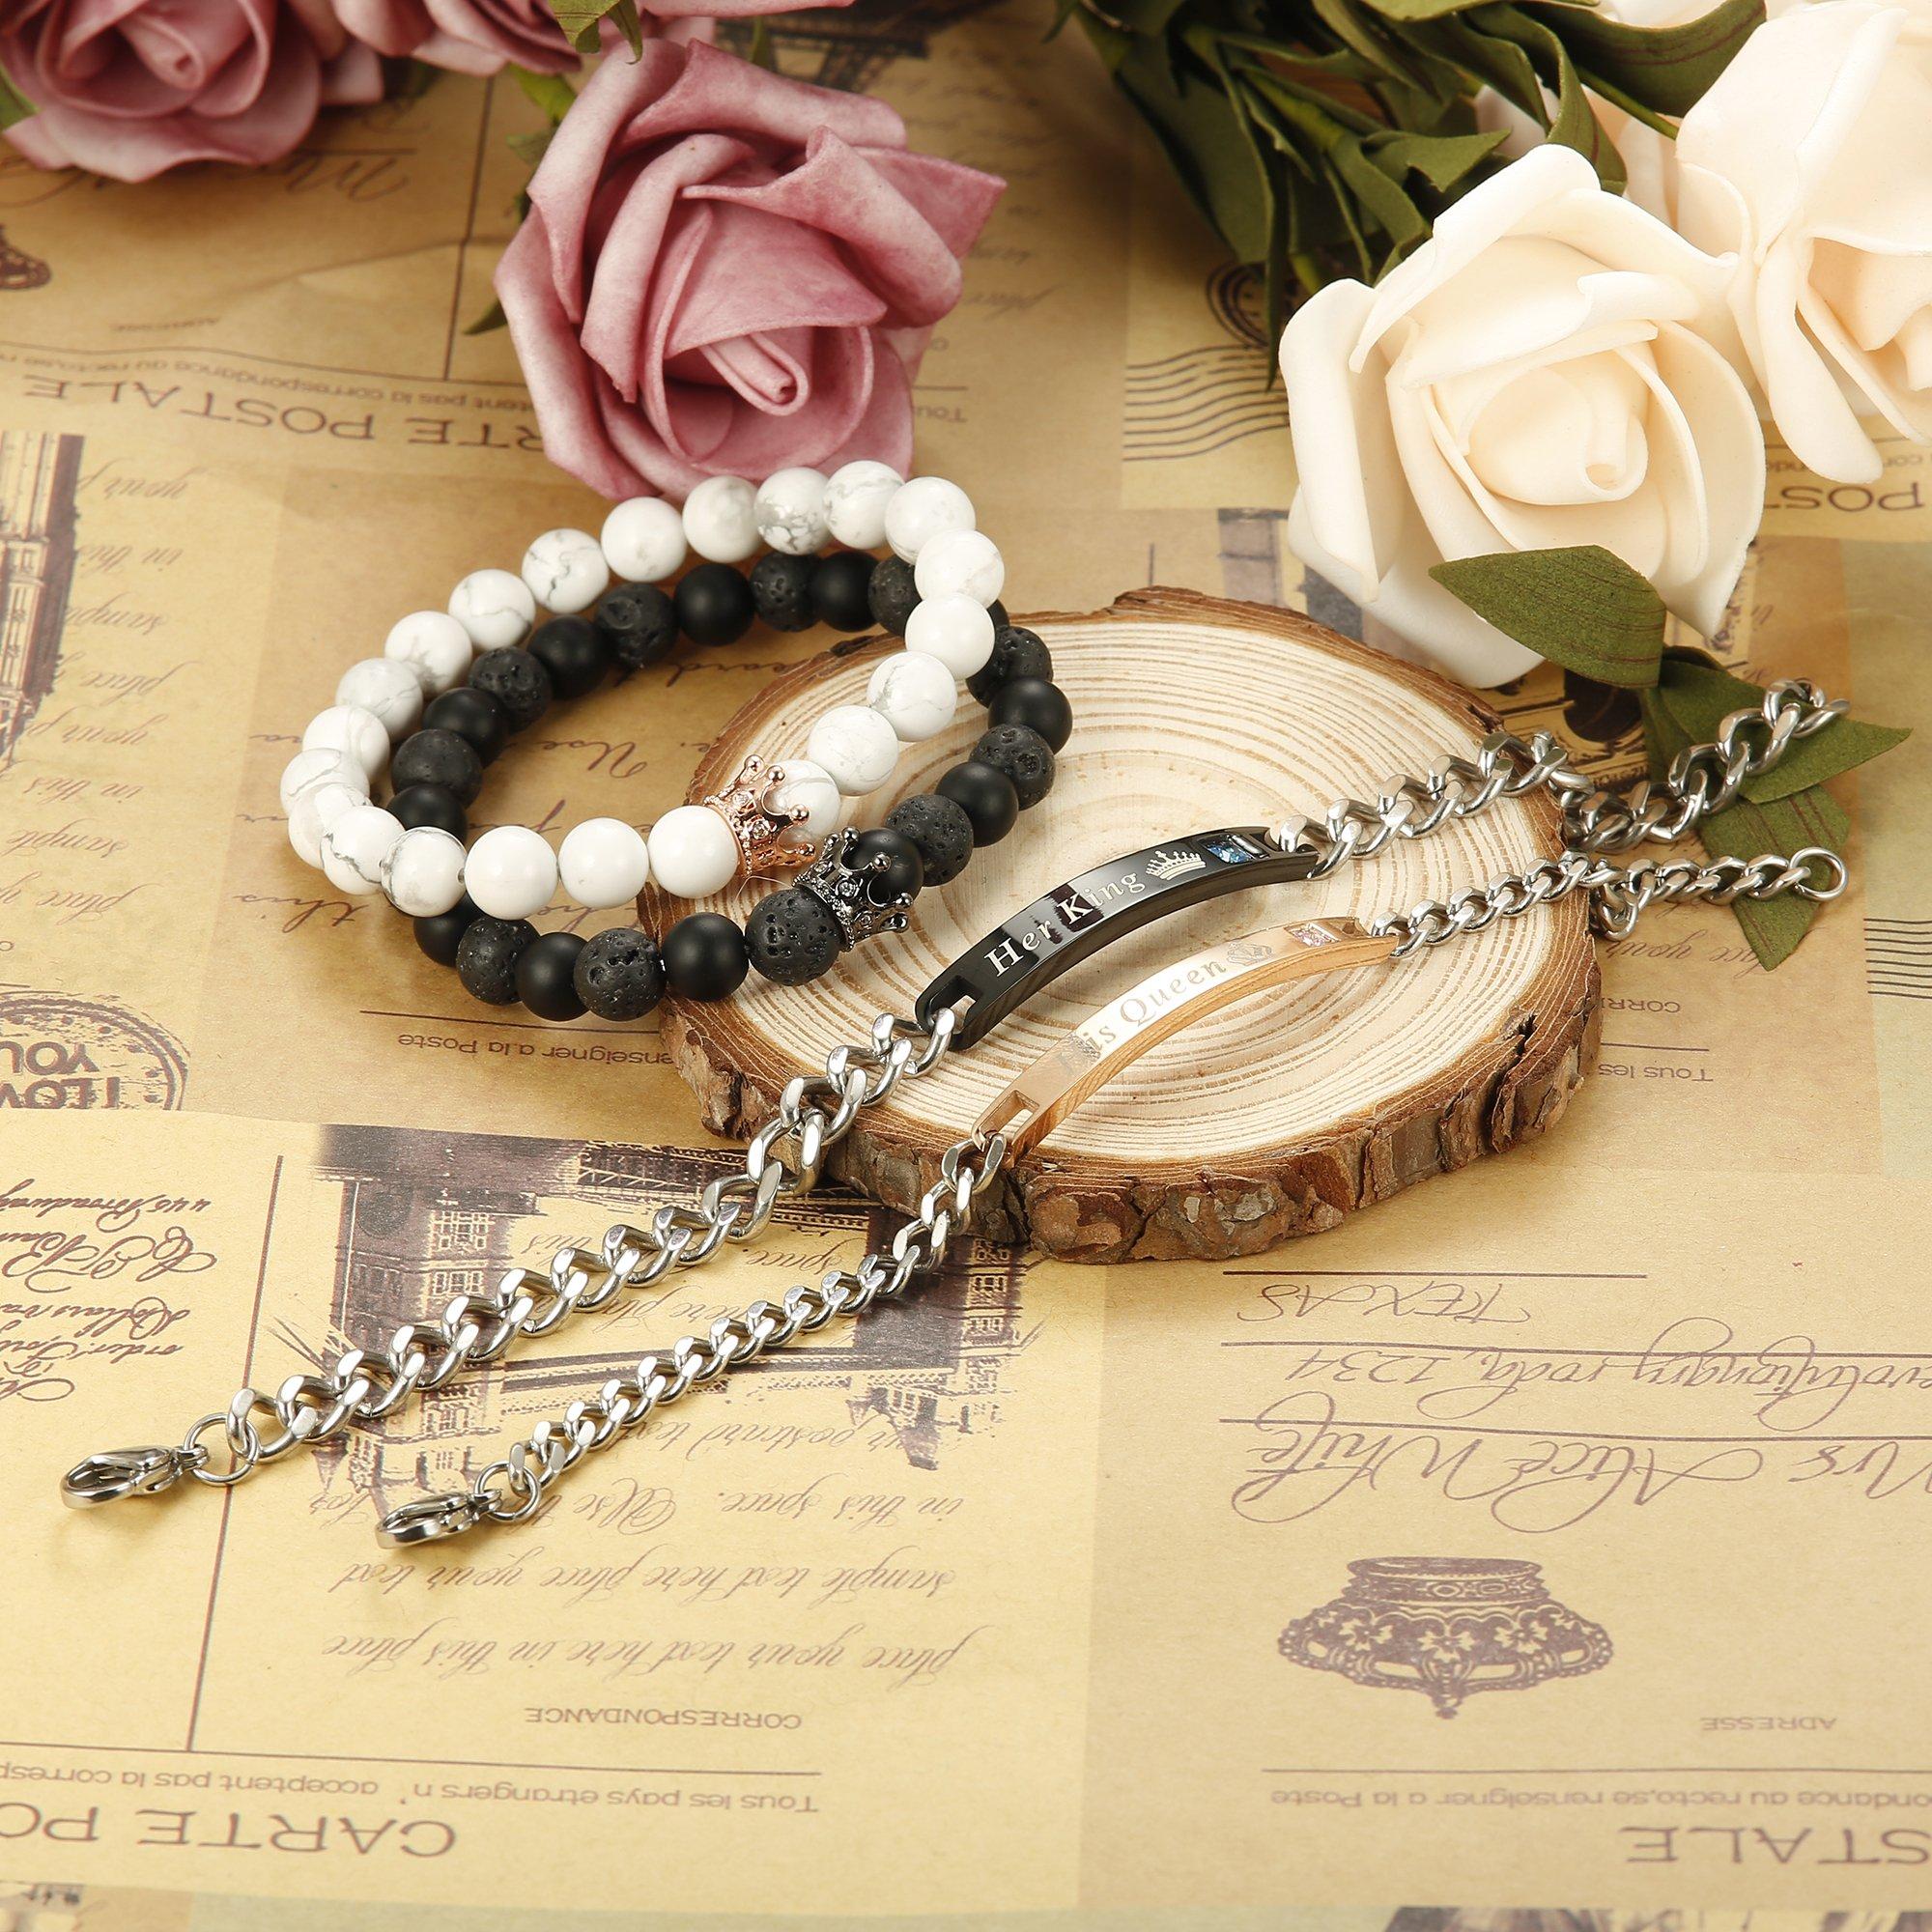 FIBO STEEL 4 Pcs Couples Bracelet for Men Women His & Her Crown Queen Bracelets Set 8mm Beads Bracelets by FIBO STEEL (Image #5)